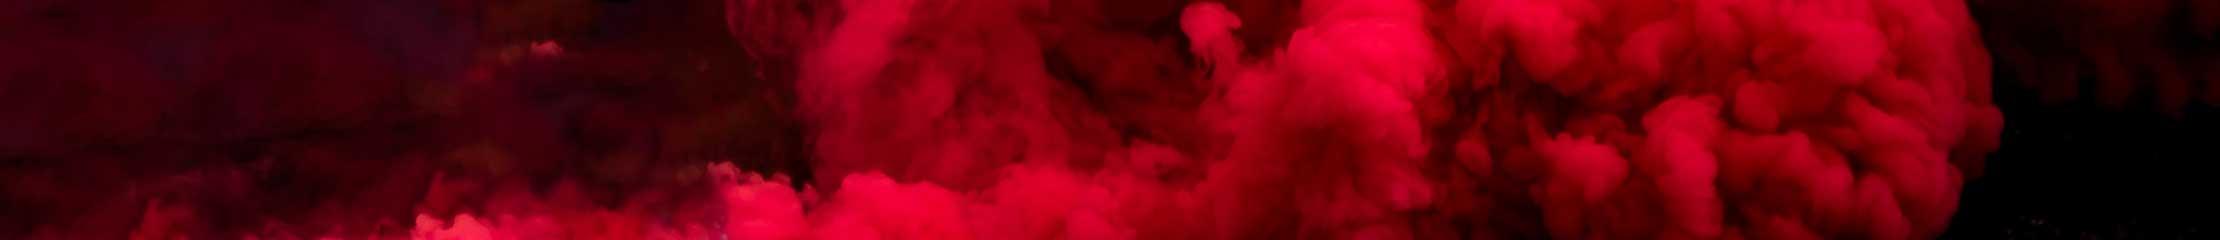 rookgranaten rook en smoke vuurwerk smoke wall smoke grenade rookfakkels